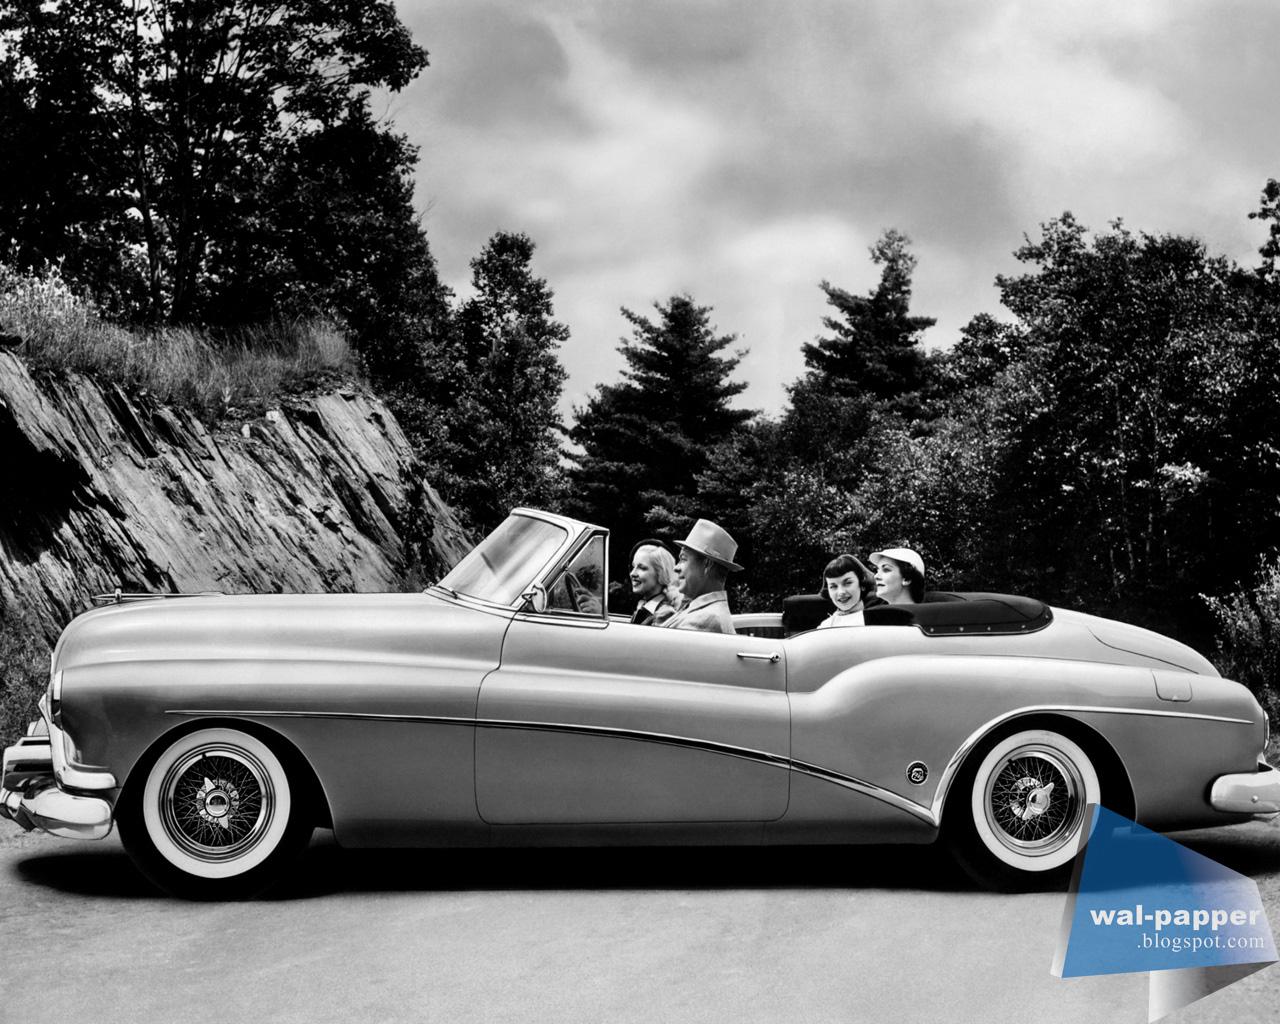 classic car wallpapers desktop old muscle car wallpaper 1280x1024